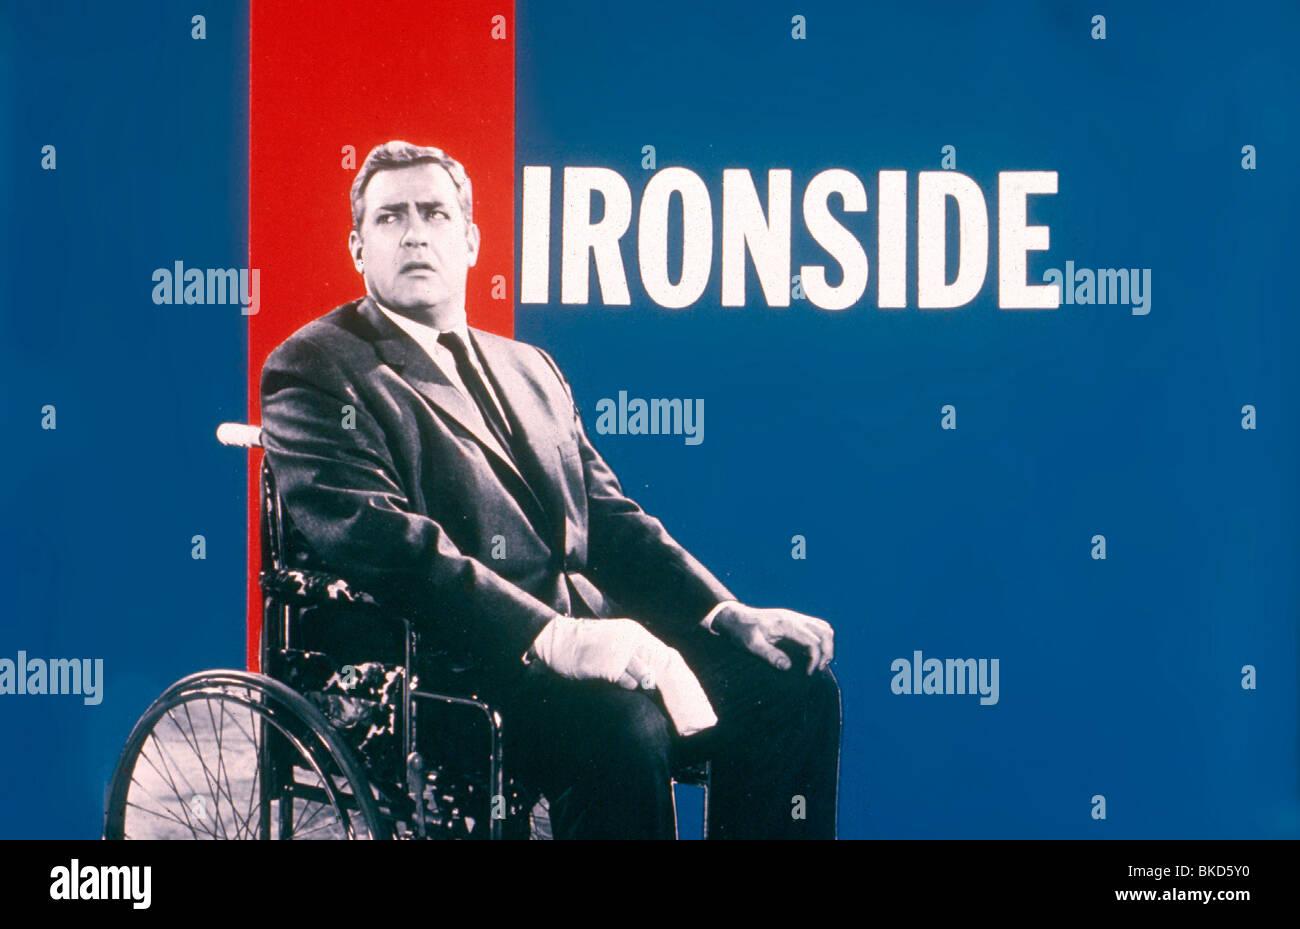 IRONSIDE (TV) RAYMOND BURR - Stock Image